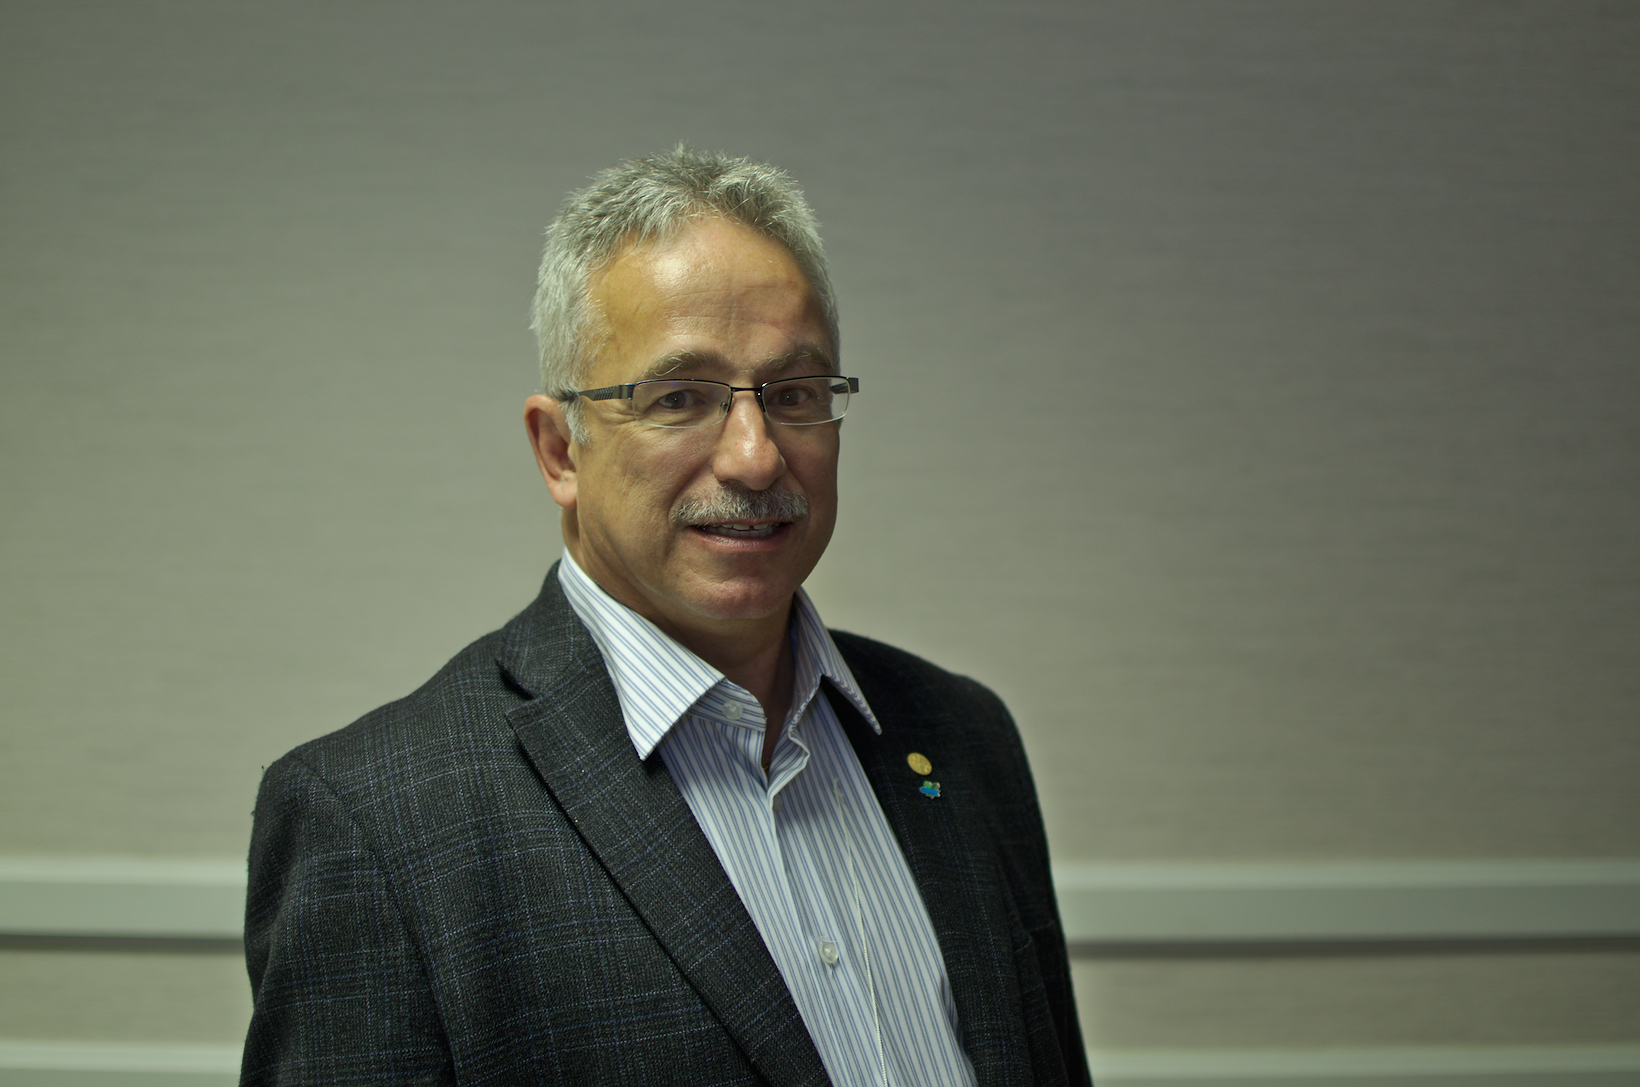 John Gagnon, USW